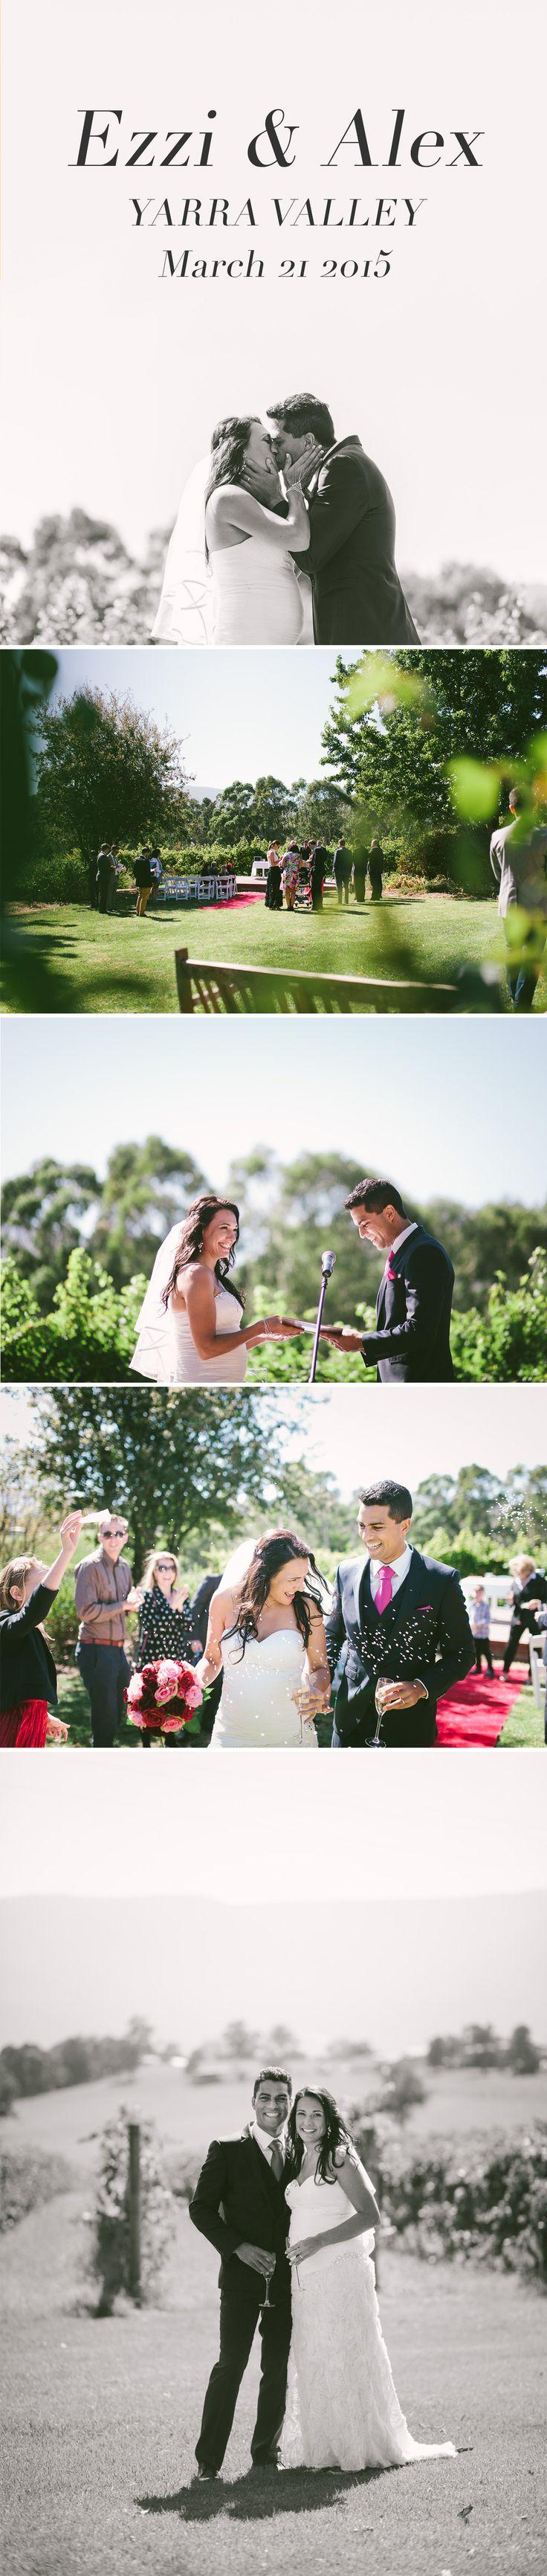 Yarra Valley Winery wedding